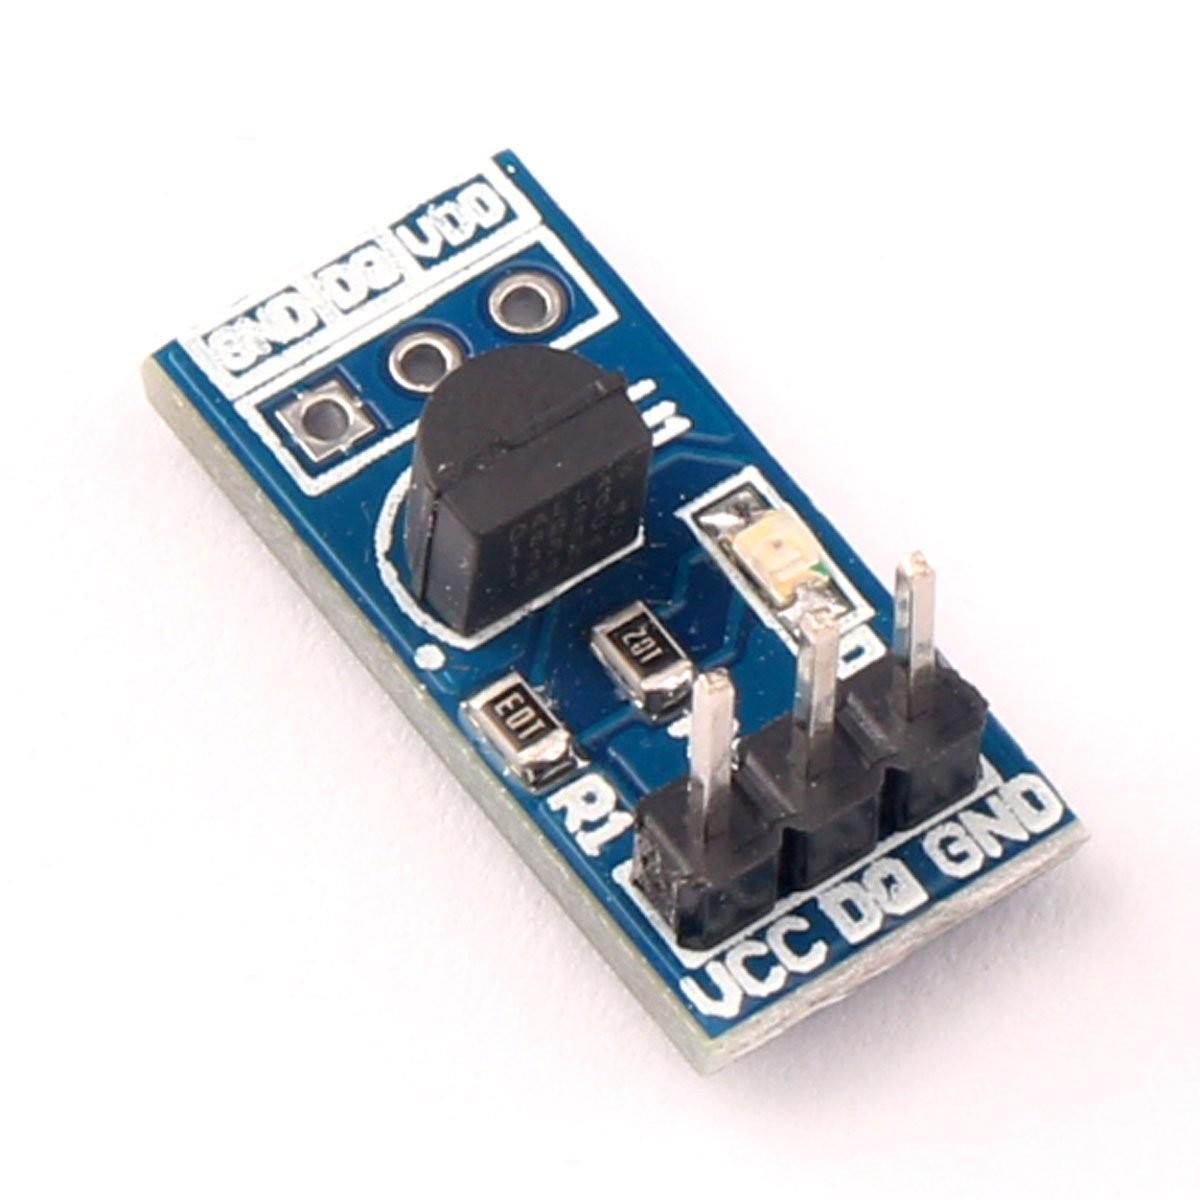 Riorand Ds18b20 Temperature Detector Sensor Module Circuit Boards Electronic Component Electronics Zoom